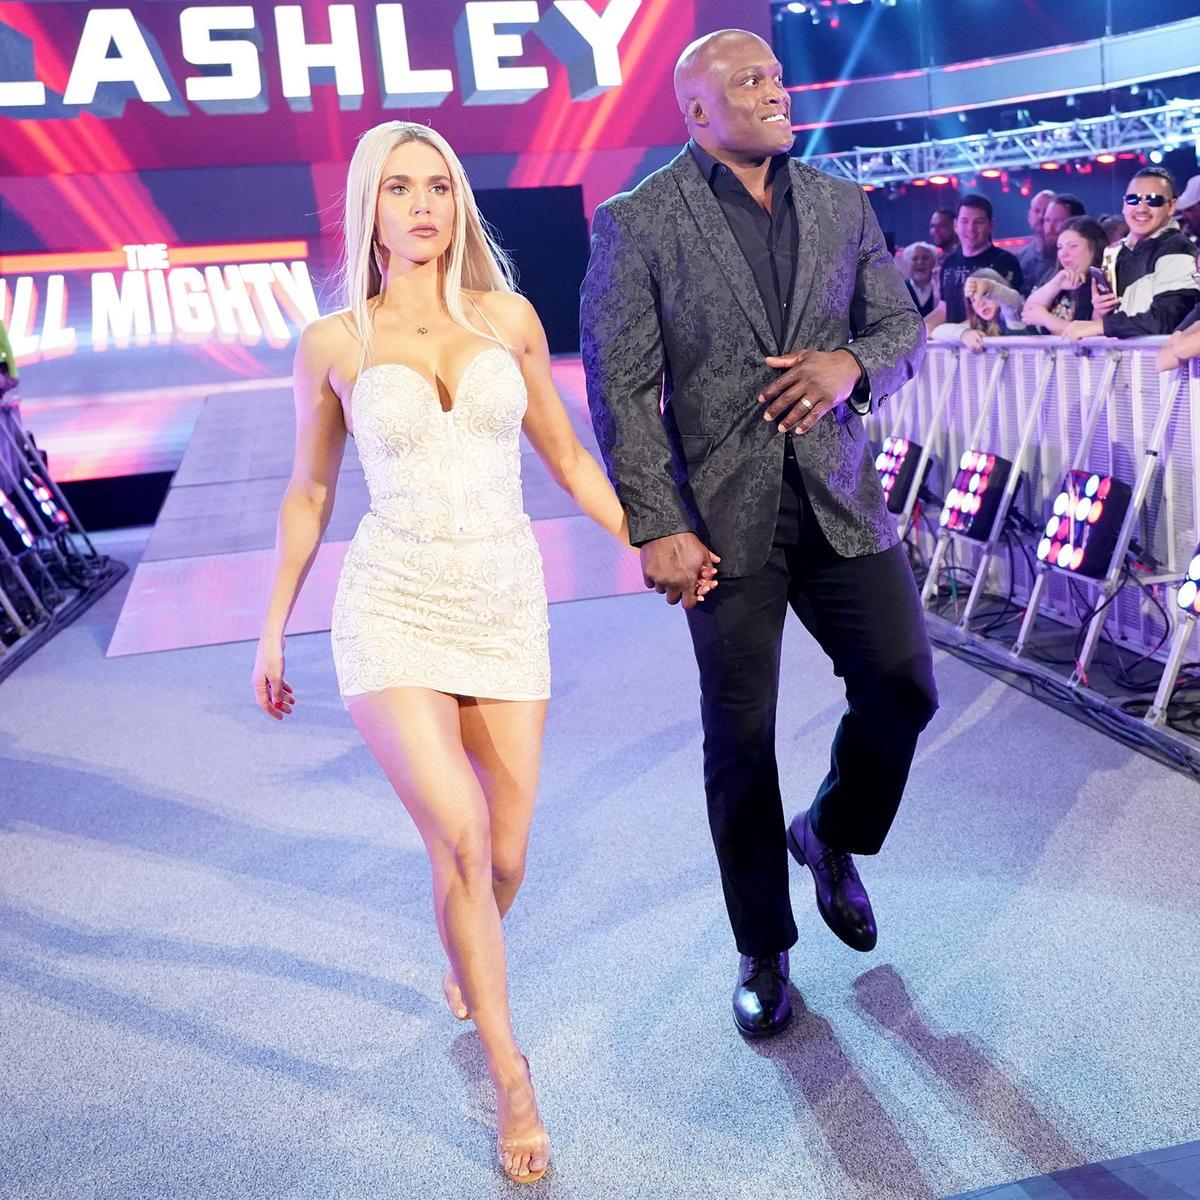 Bobby Lashley Thinks WWE Angle With Lana Made Him Versatile Performer 2